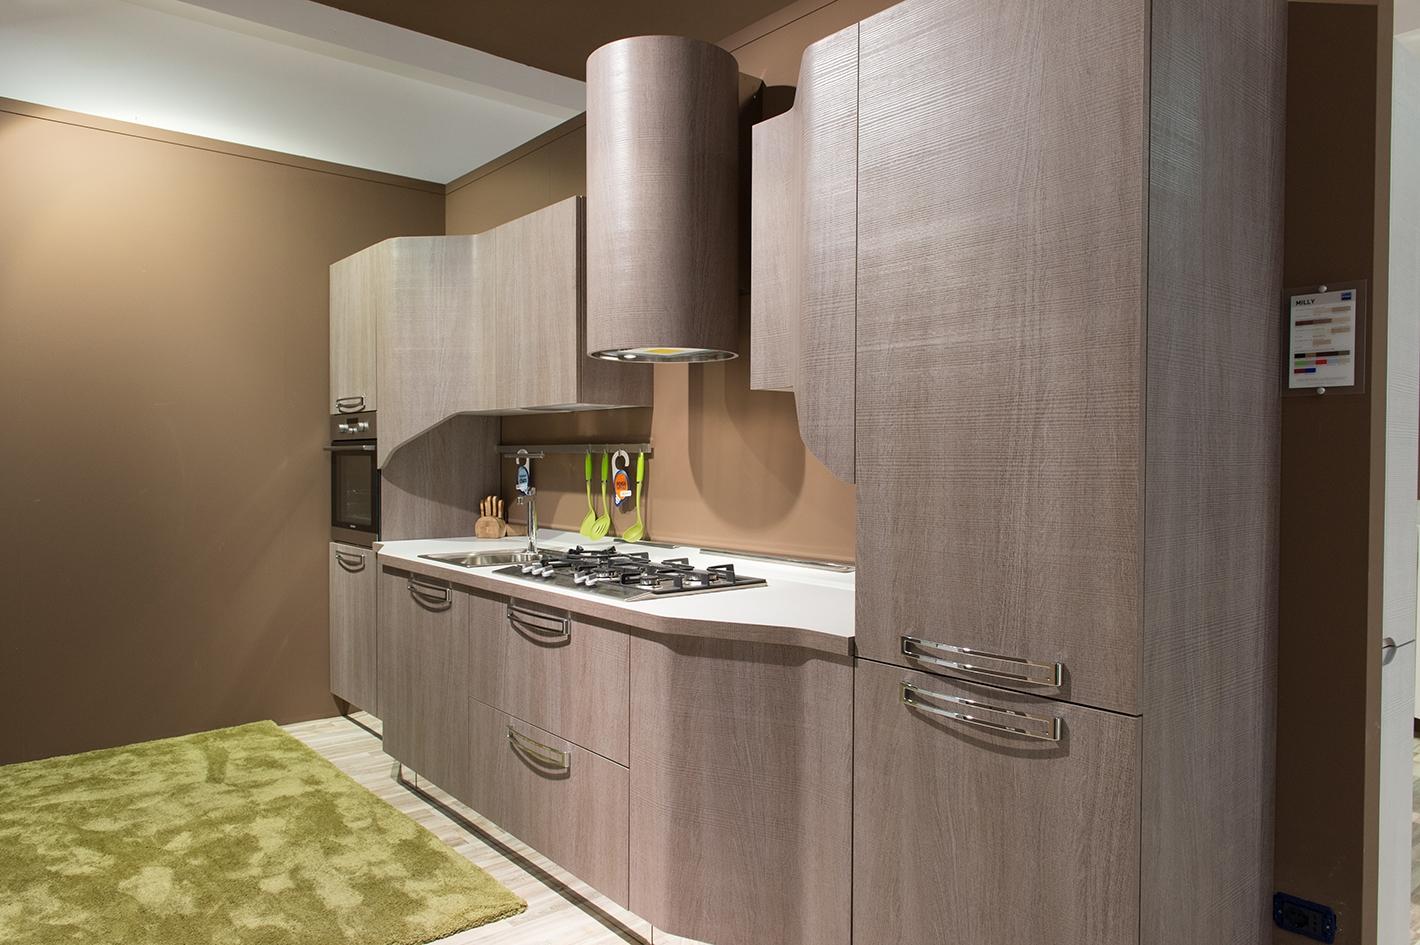 Cucina stosa milly completa di elettrodomestici 20982 cucine a prezzi scontati - Cucina completa prezzi ...